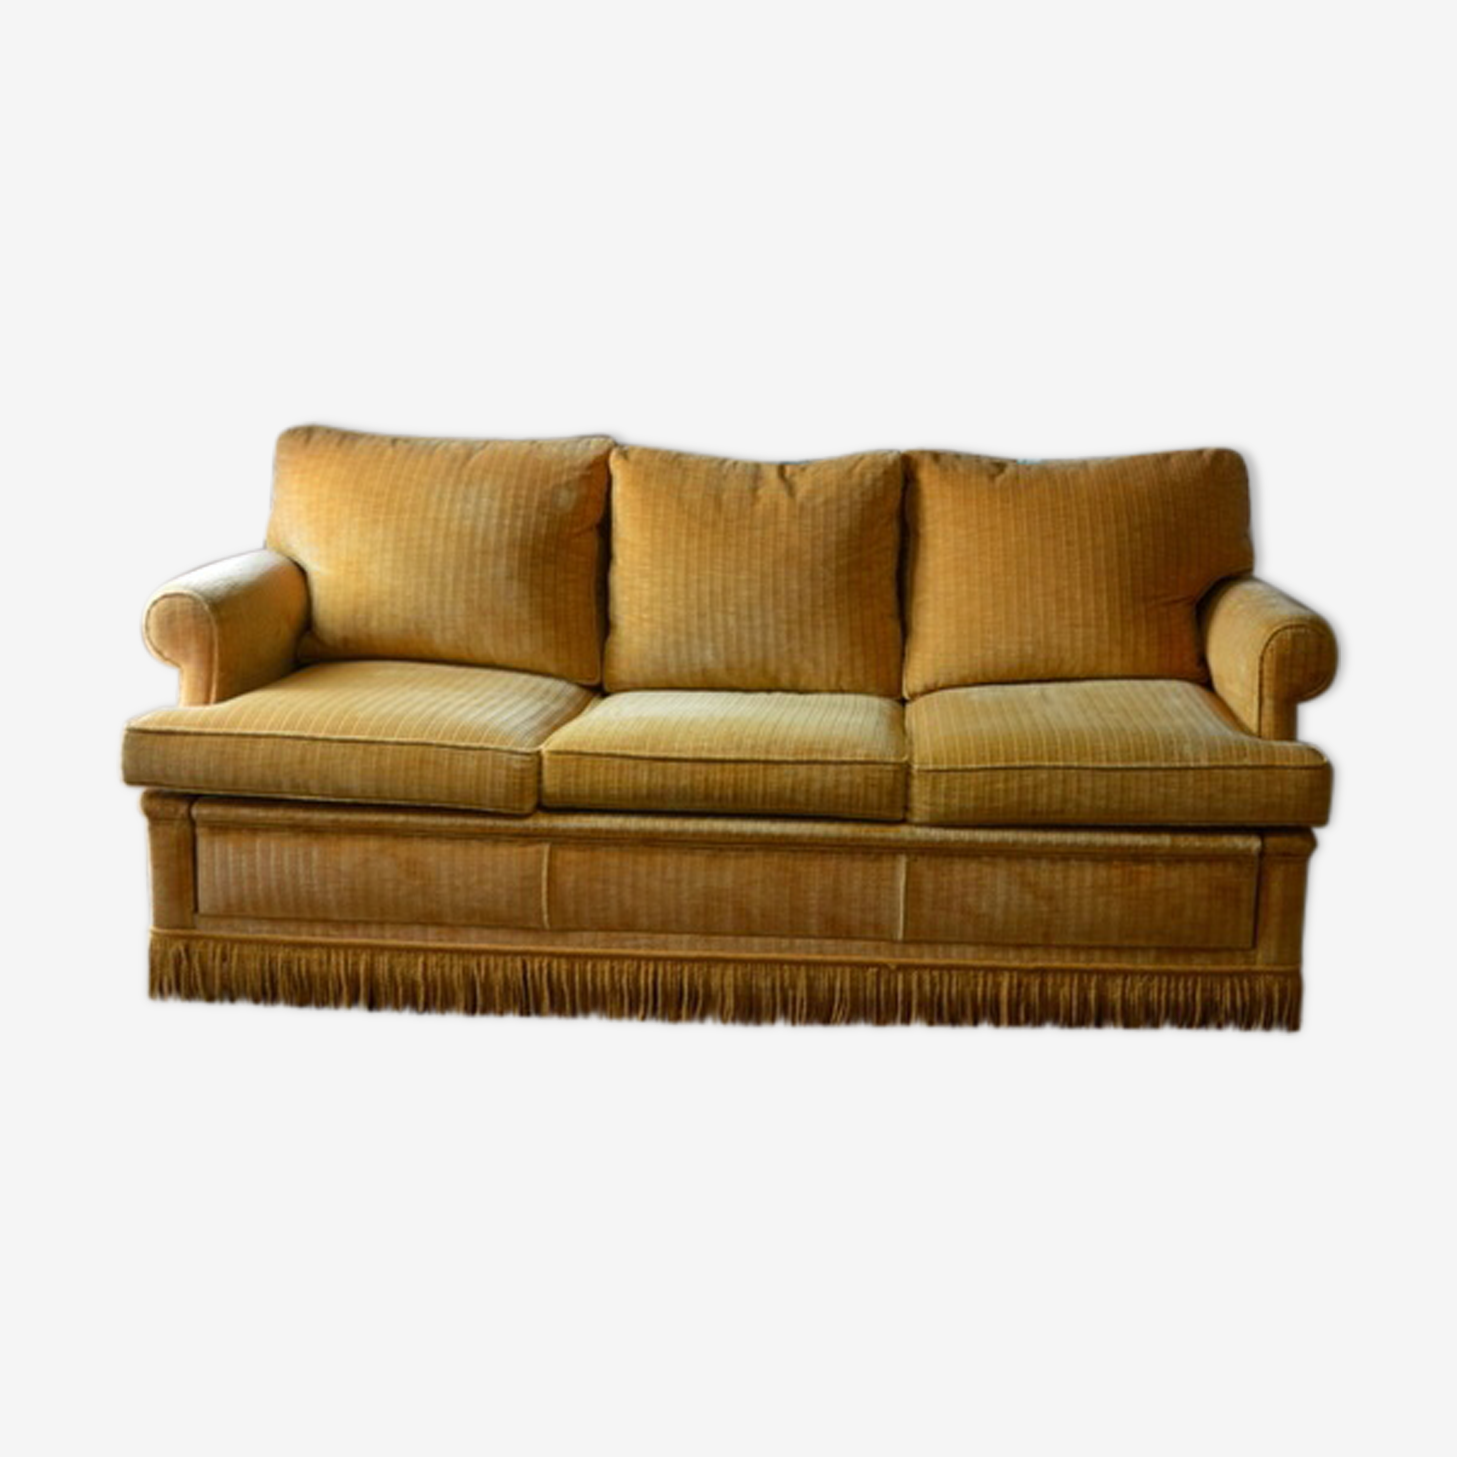 Sofa velvet vintage mustard year 60